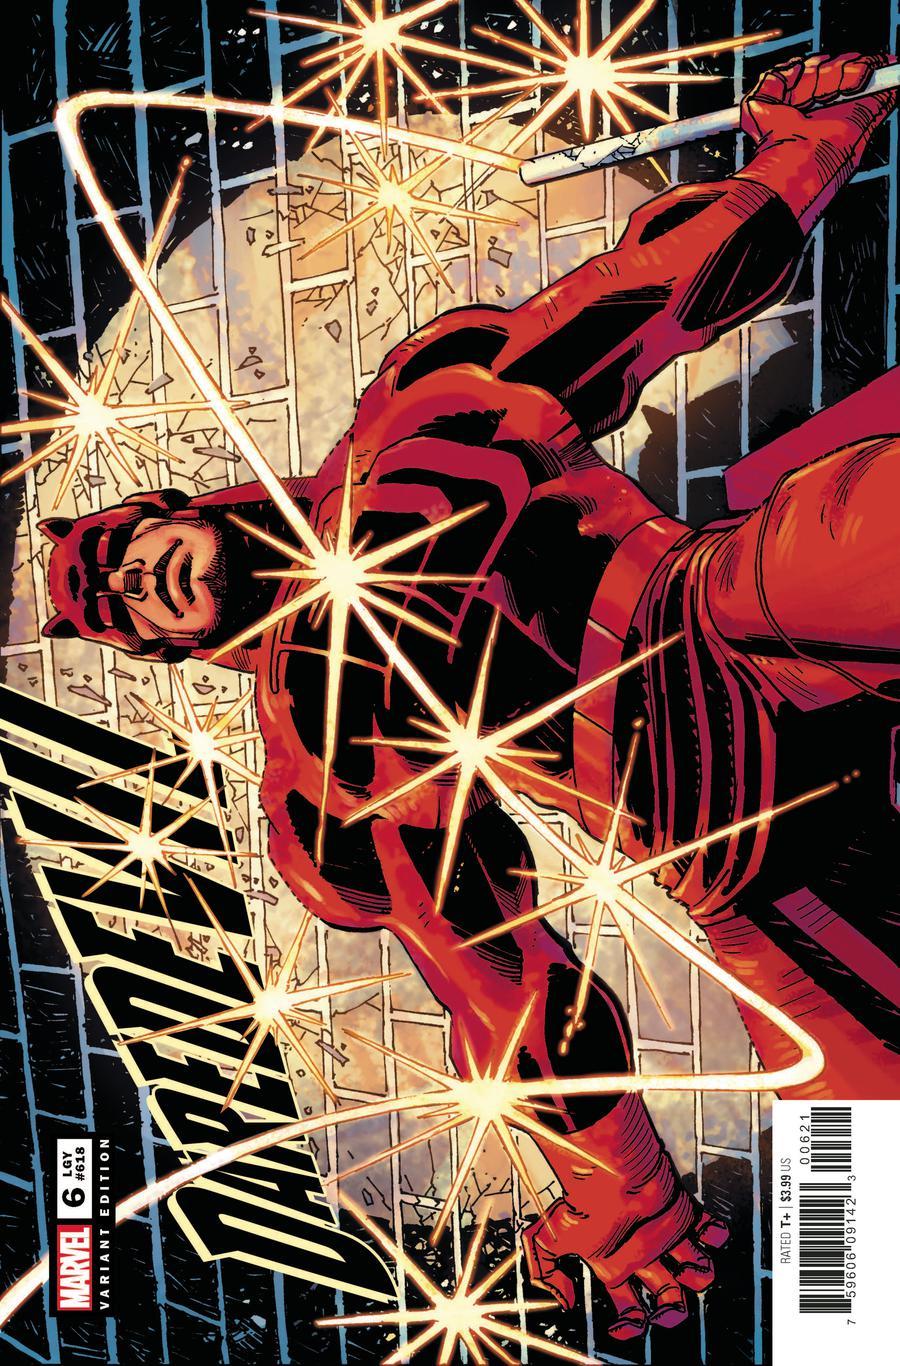 Daredevil Vol 6 #6 Cover B Incentive John Romita Jr Hidden Gem Variant Cover